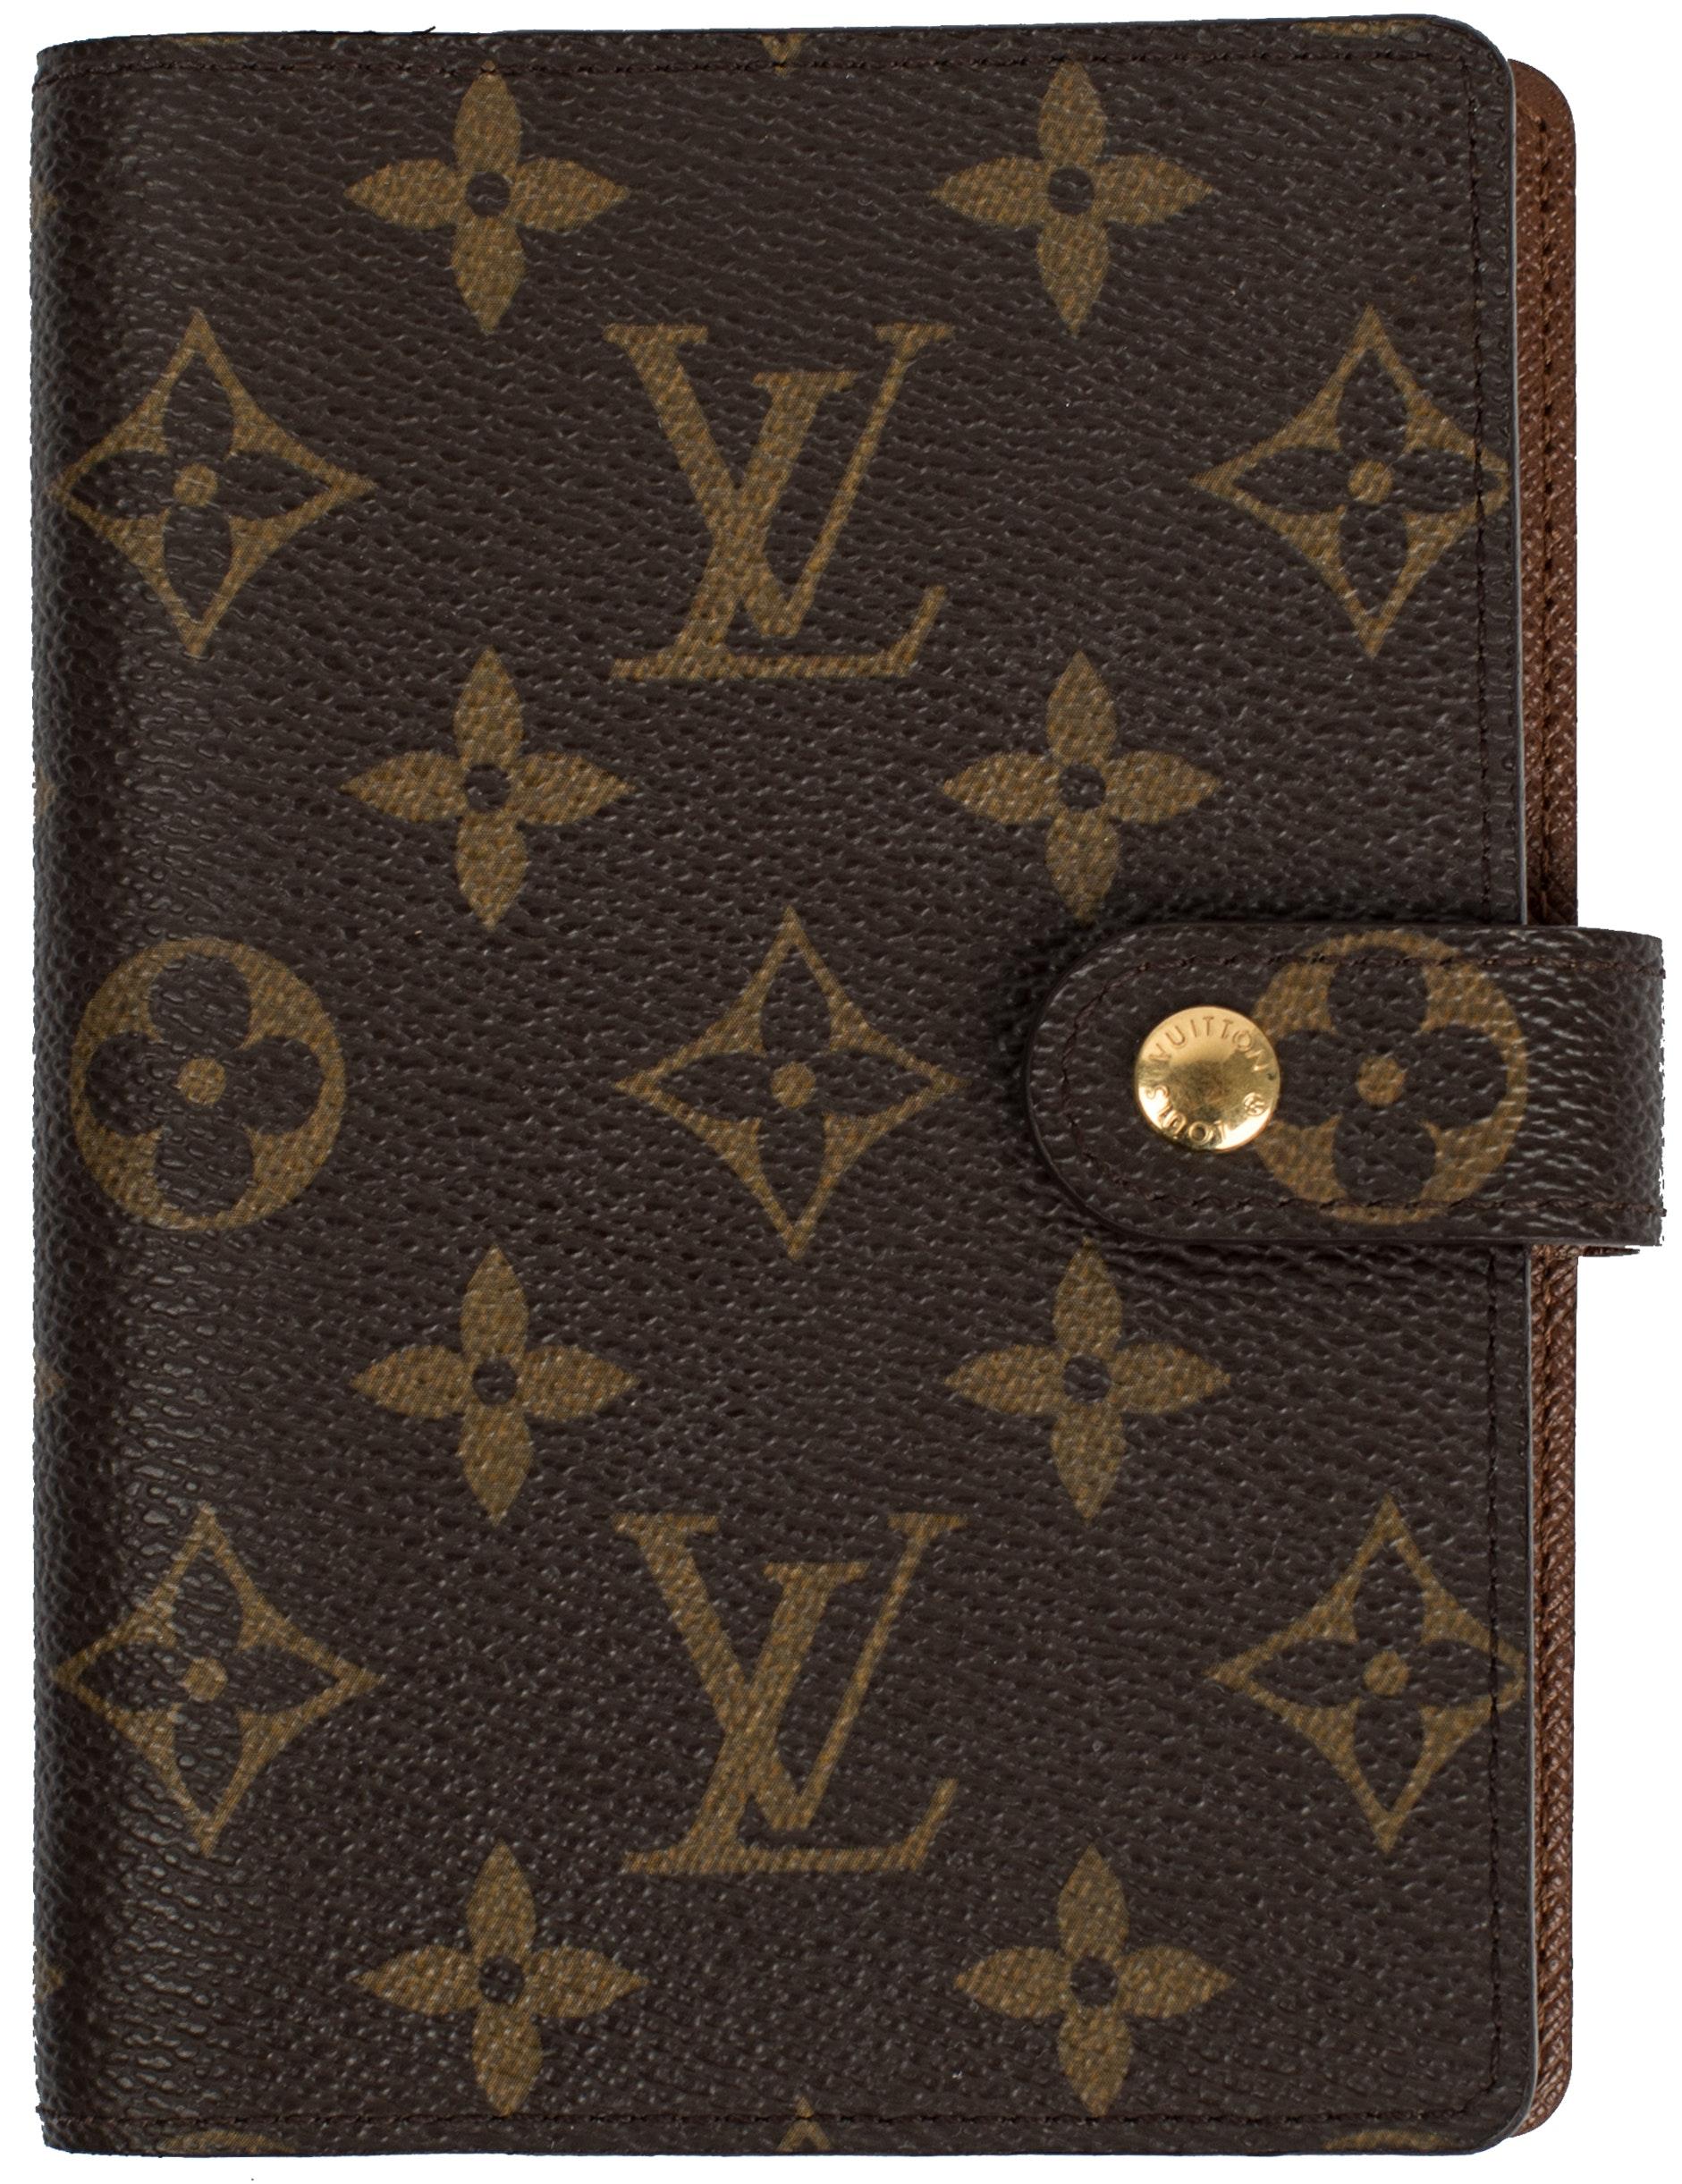 Louis Vuitton Agenda Cover Small Ring Monogram Brown